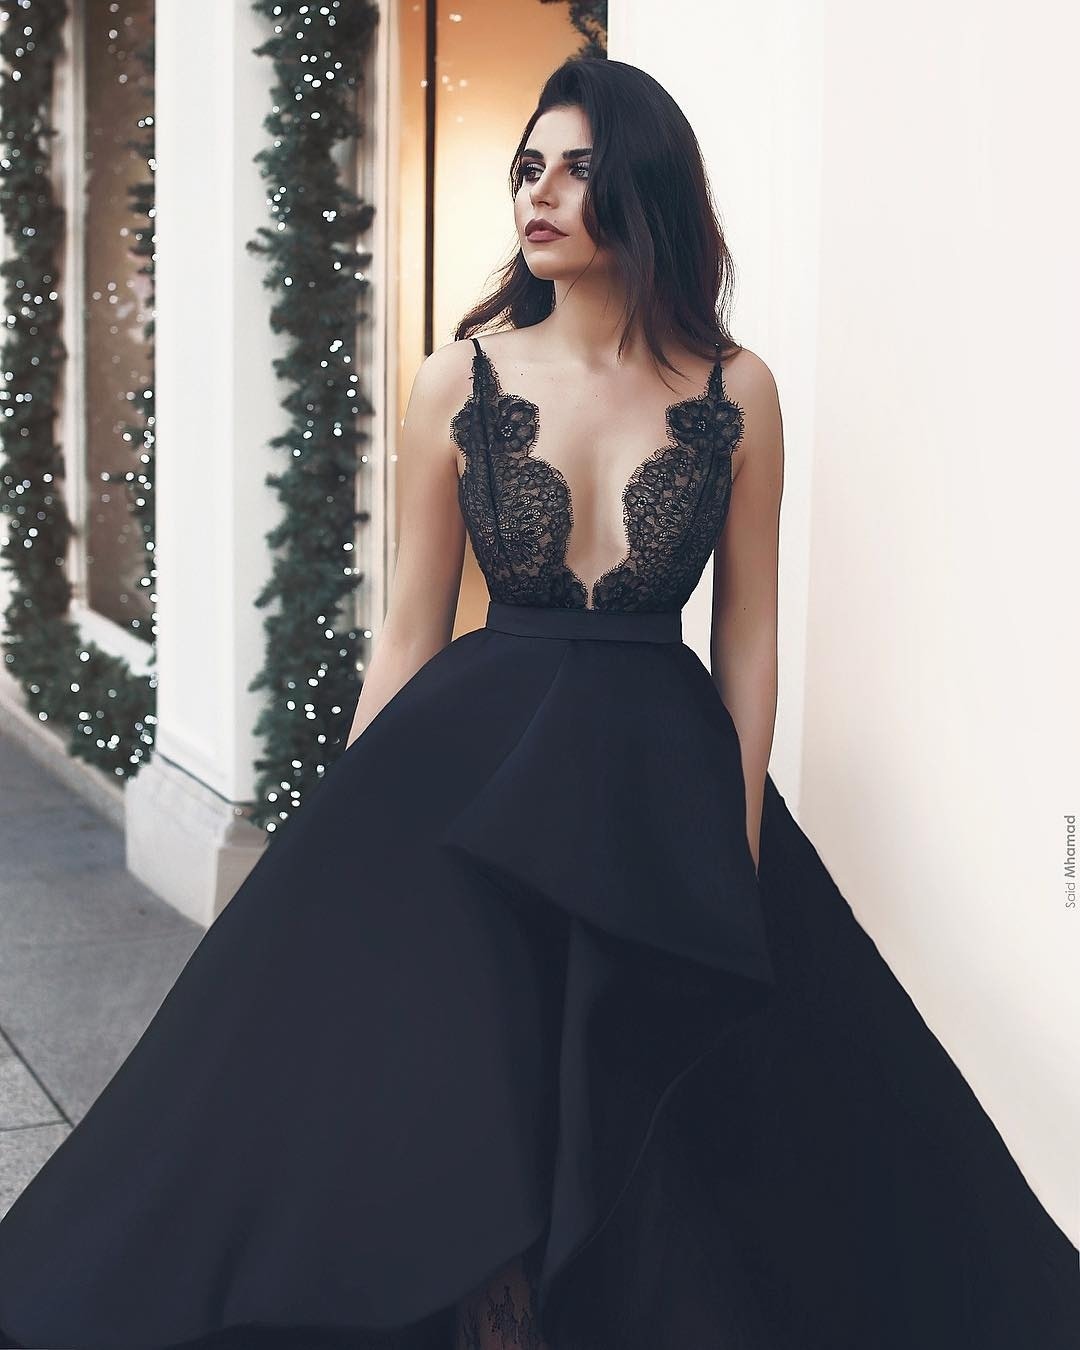 Perfekt Schwarzes Abendkleid Lang Spitze BoutiqueDesigner Ausgezeichnet Schwarzes Abendkleid Lang Spitze Vertrieb